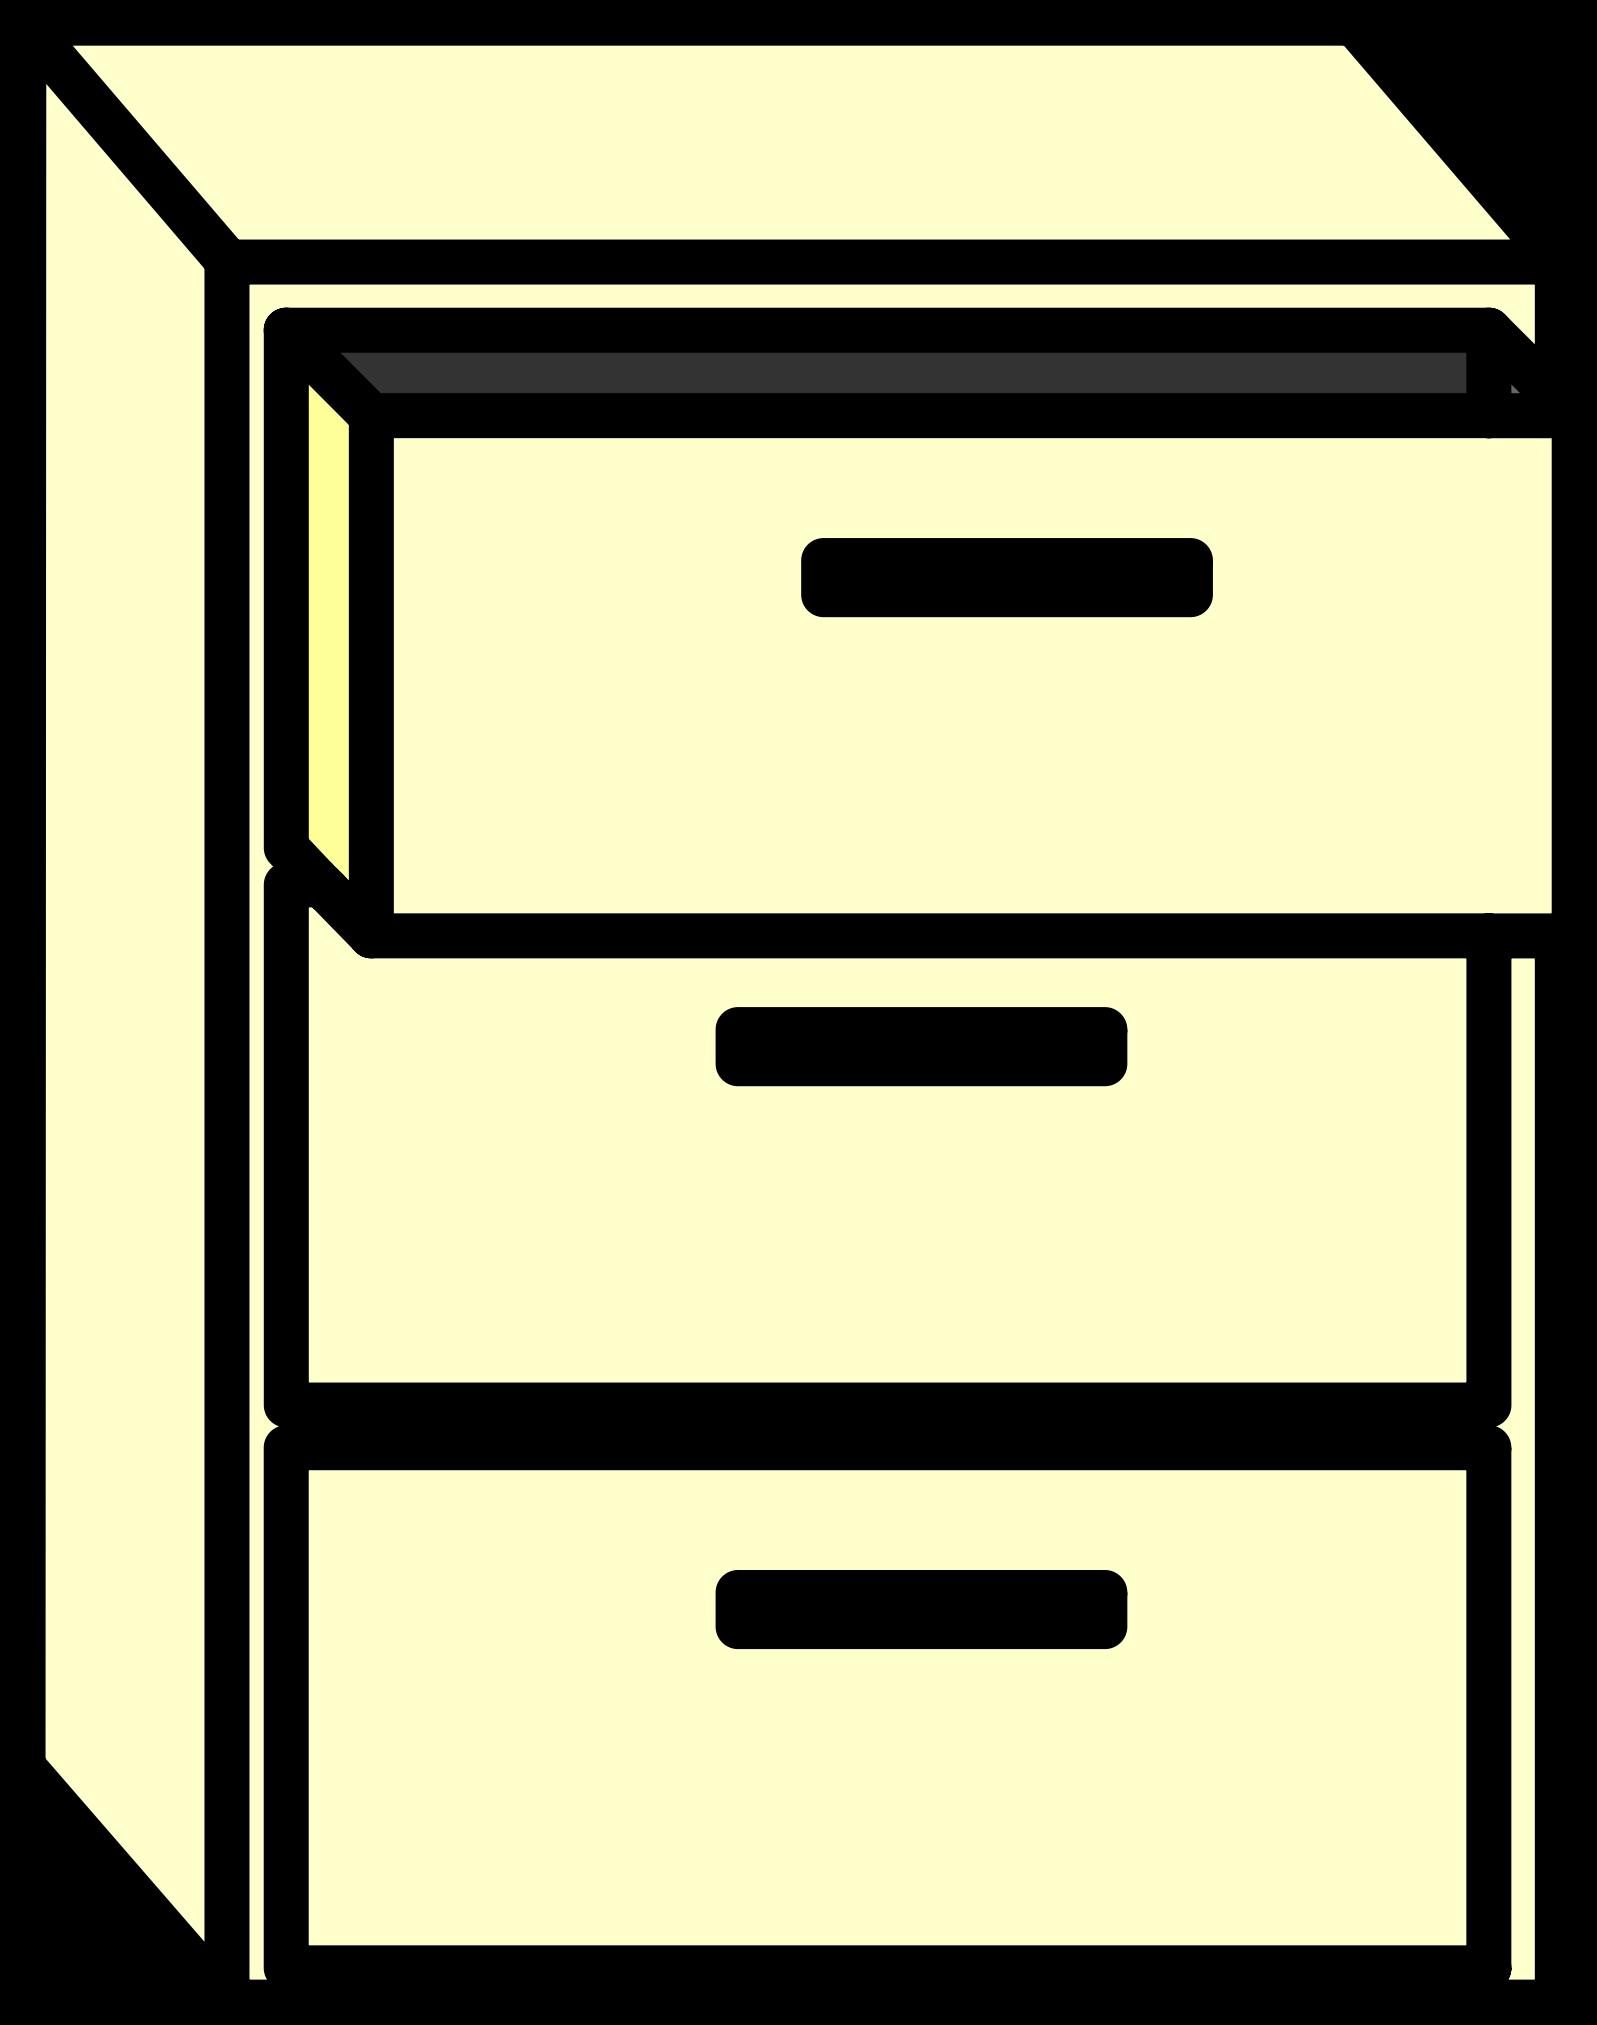 Open Cabinet Clipart Clipart Suggest